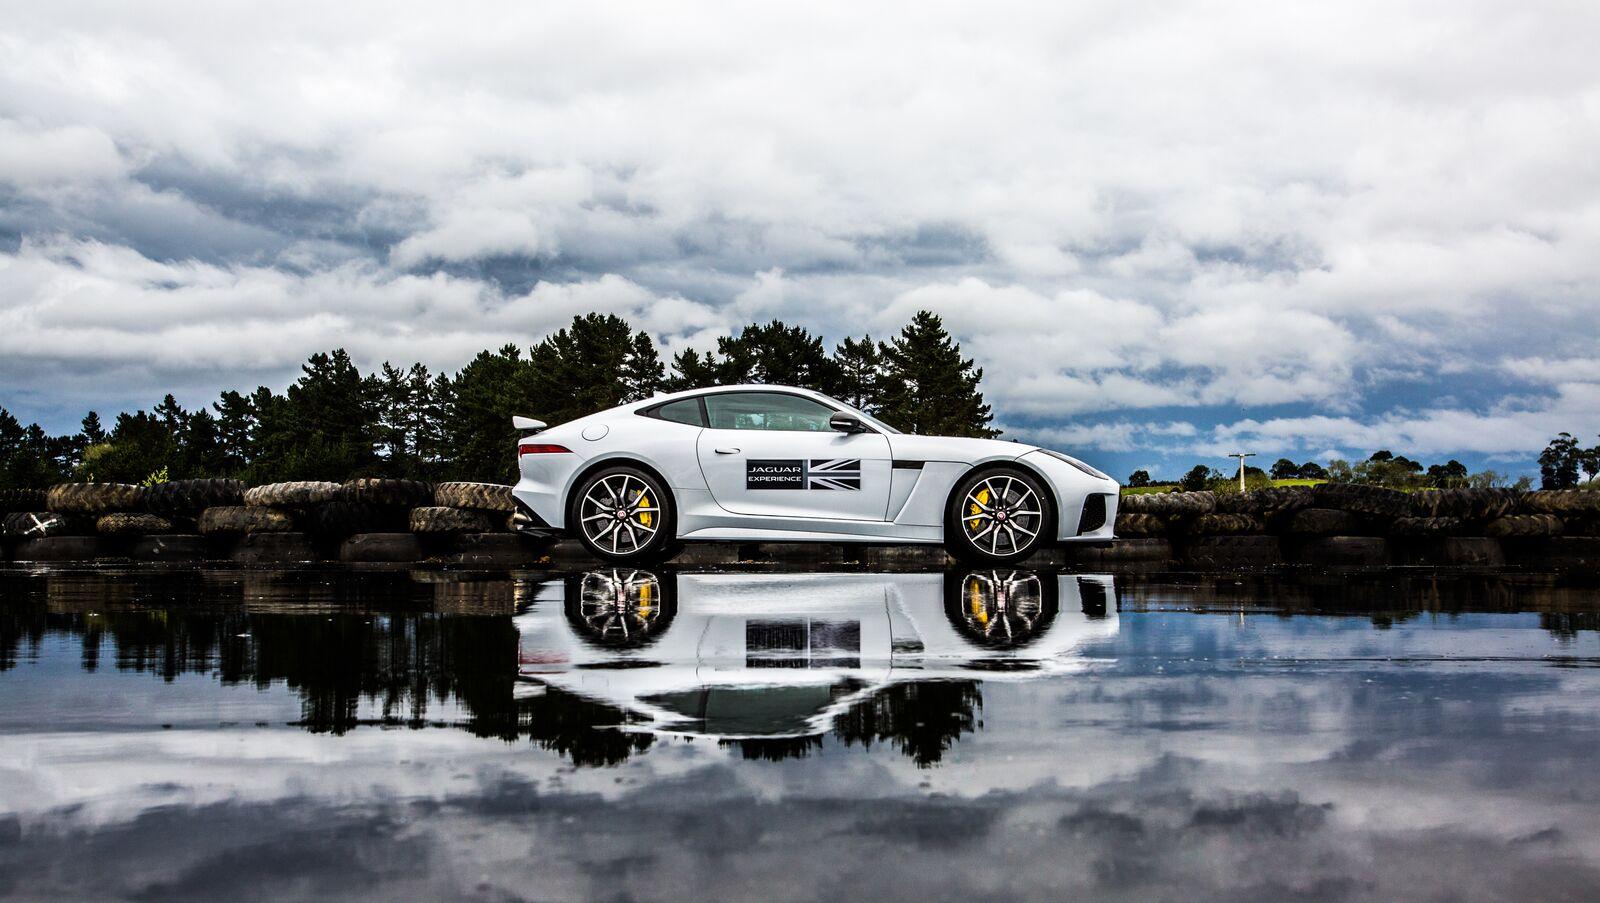 Jaguar-508_preview - Copy.jpeg